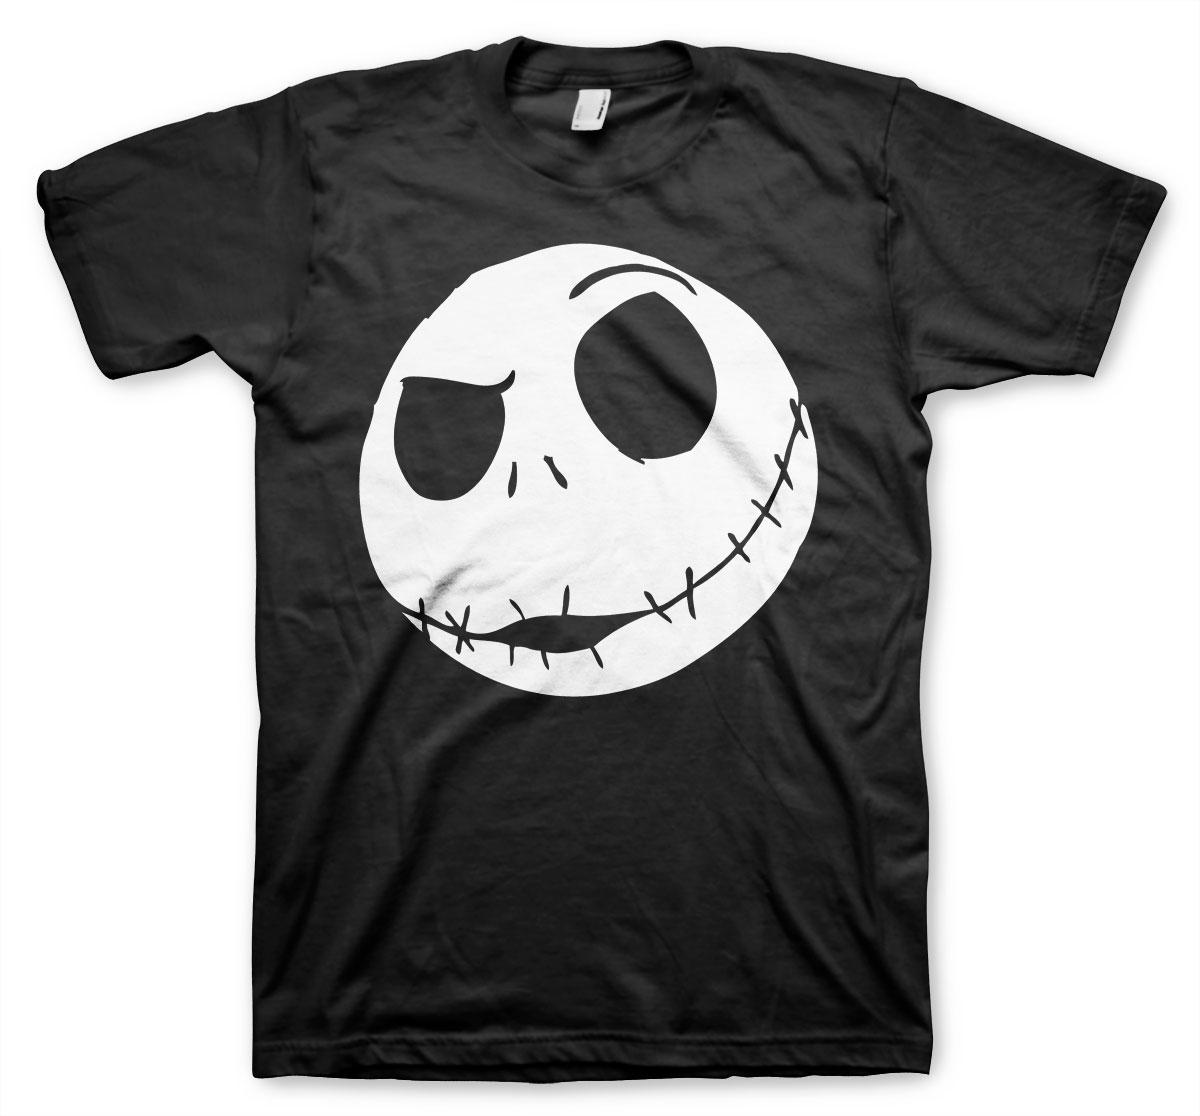 the-nightmare-before-christmas-jack-skellington-t-shirt